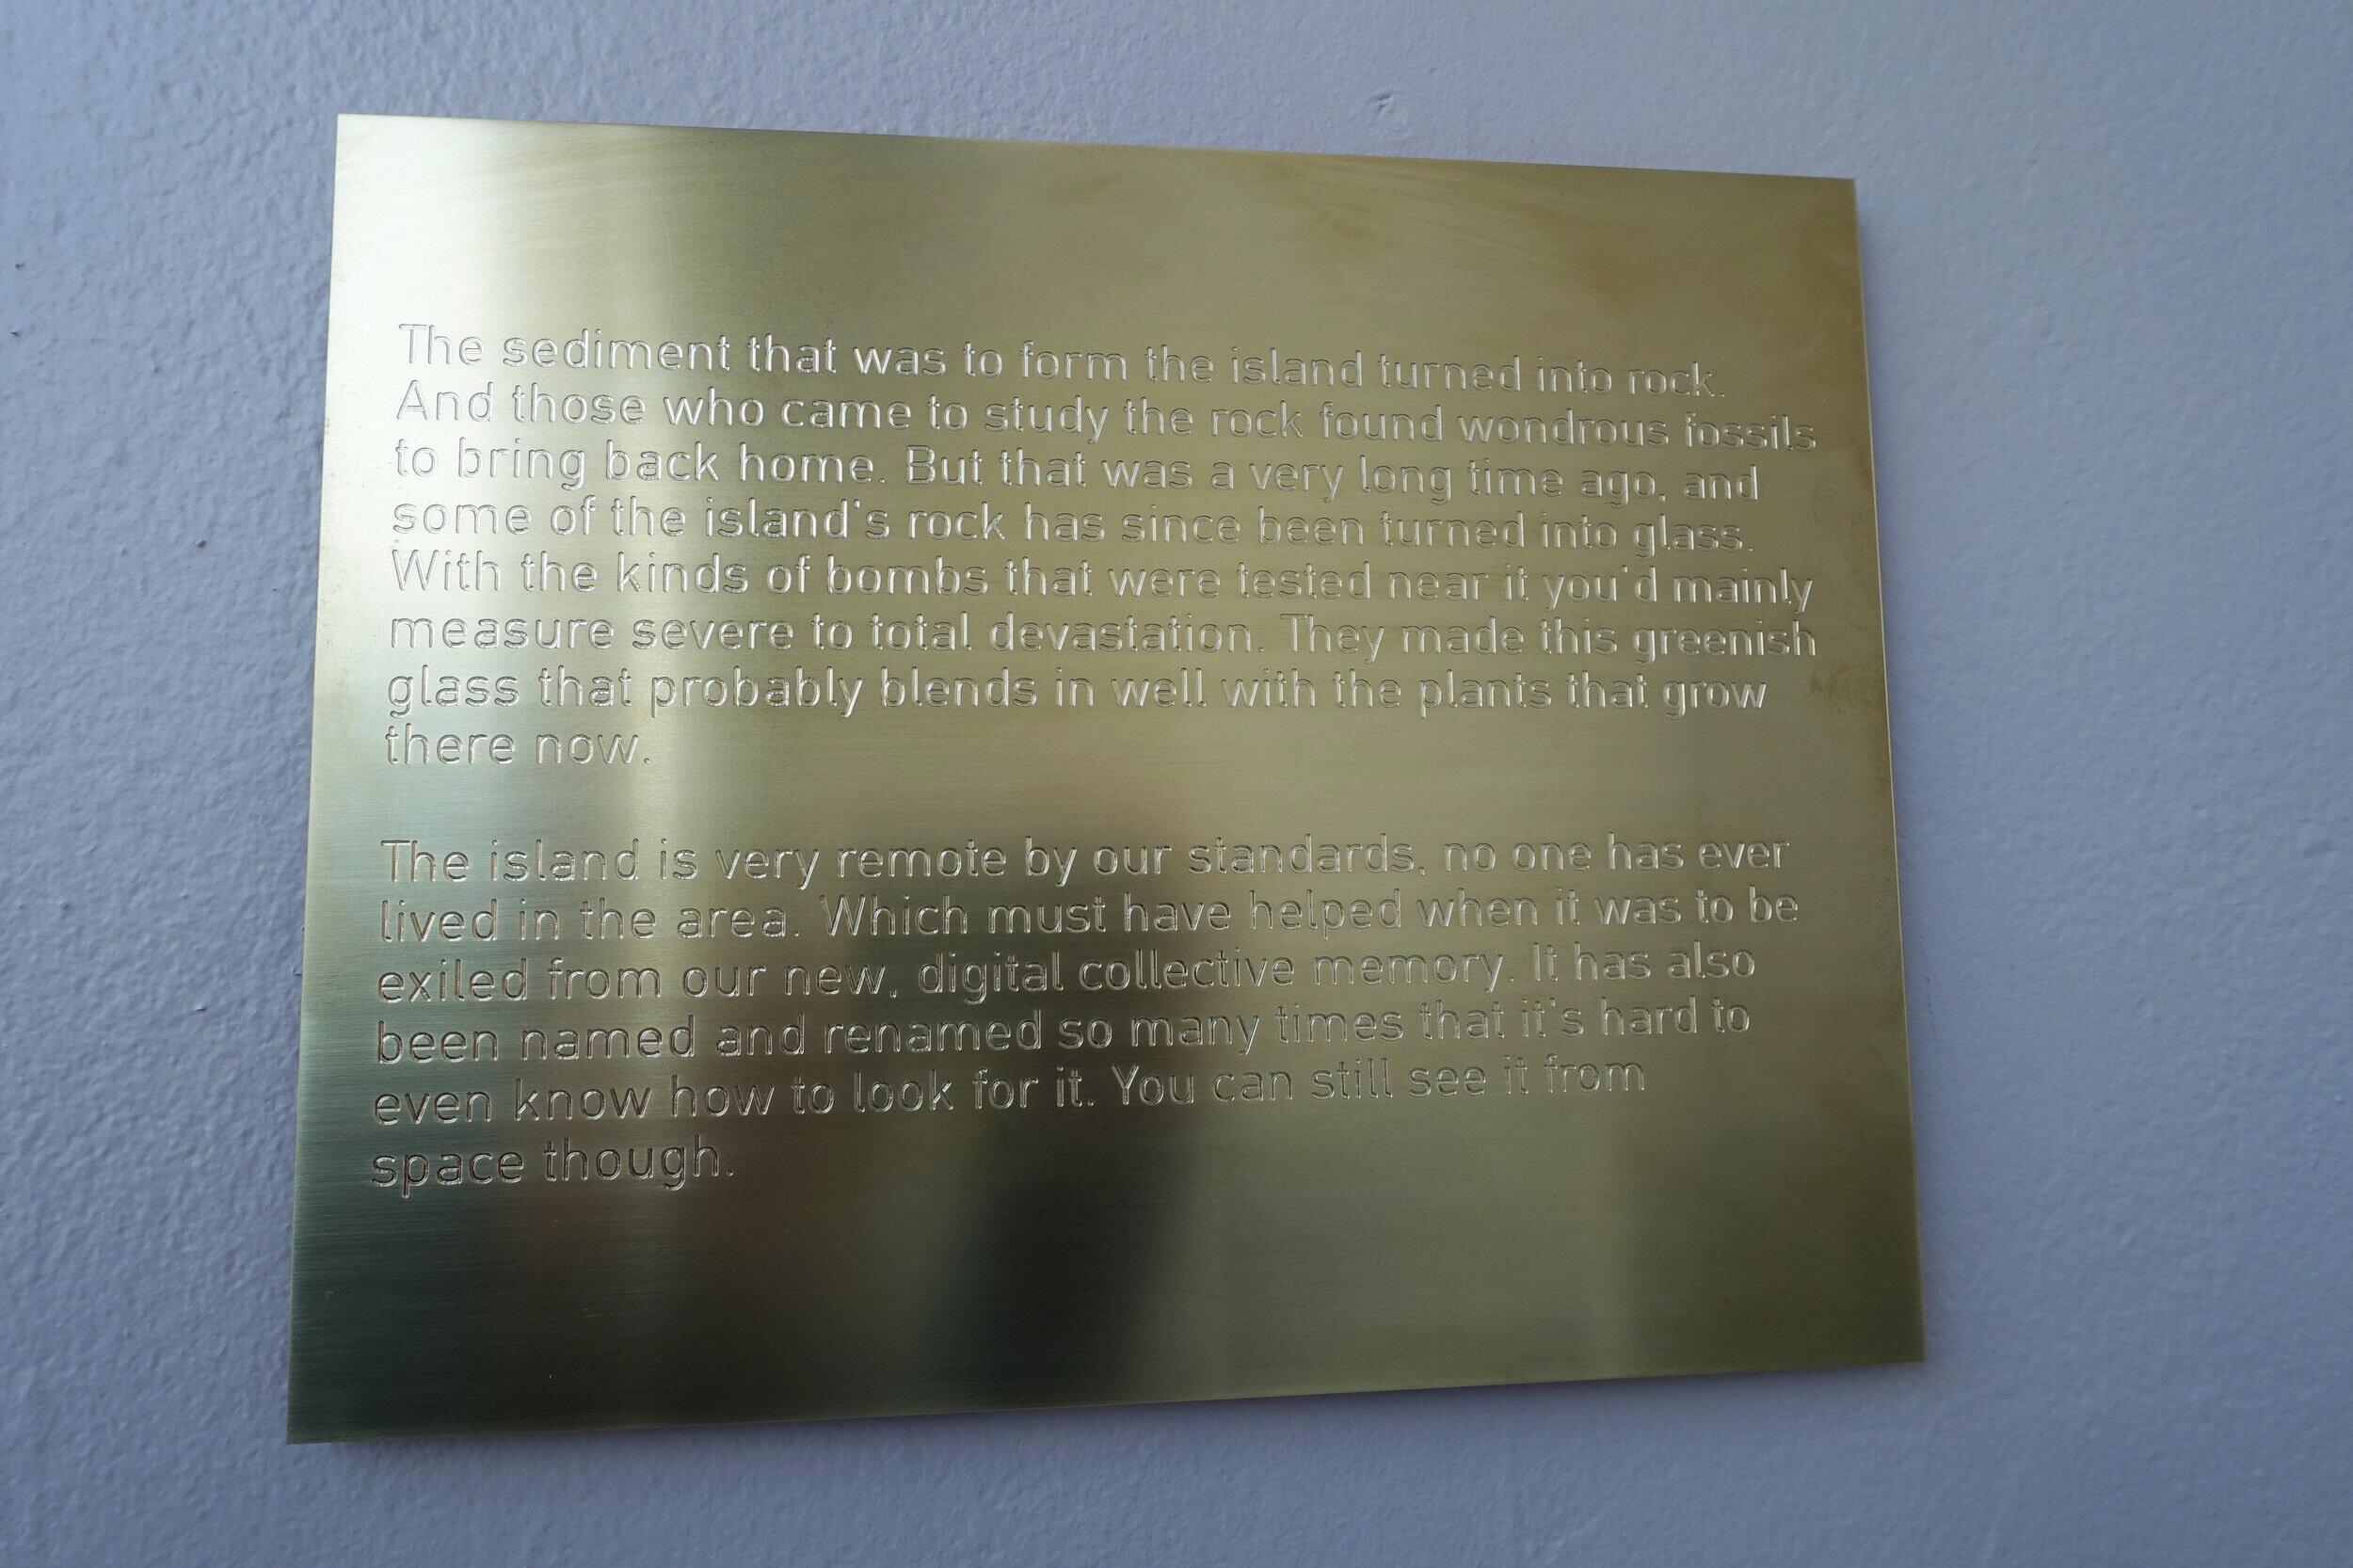 Fra utstillingen  Mineral Deposits  hos Studio17. Detalj fra Daniel Hansens  An Island Between, II  Foto: Arnhild Sunnanå